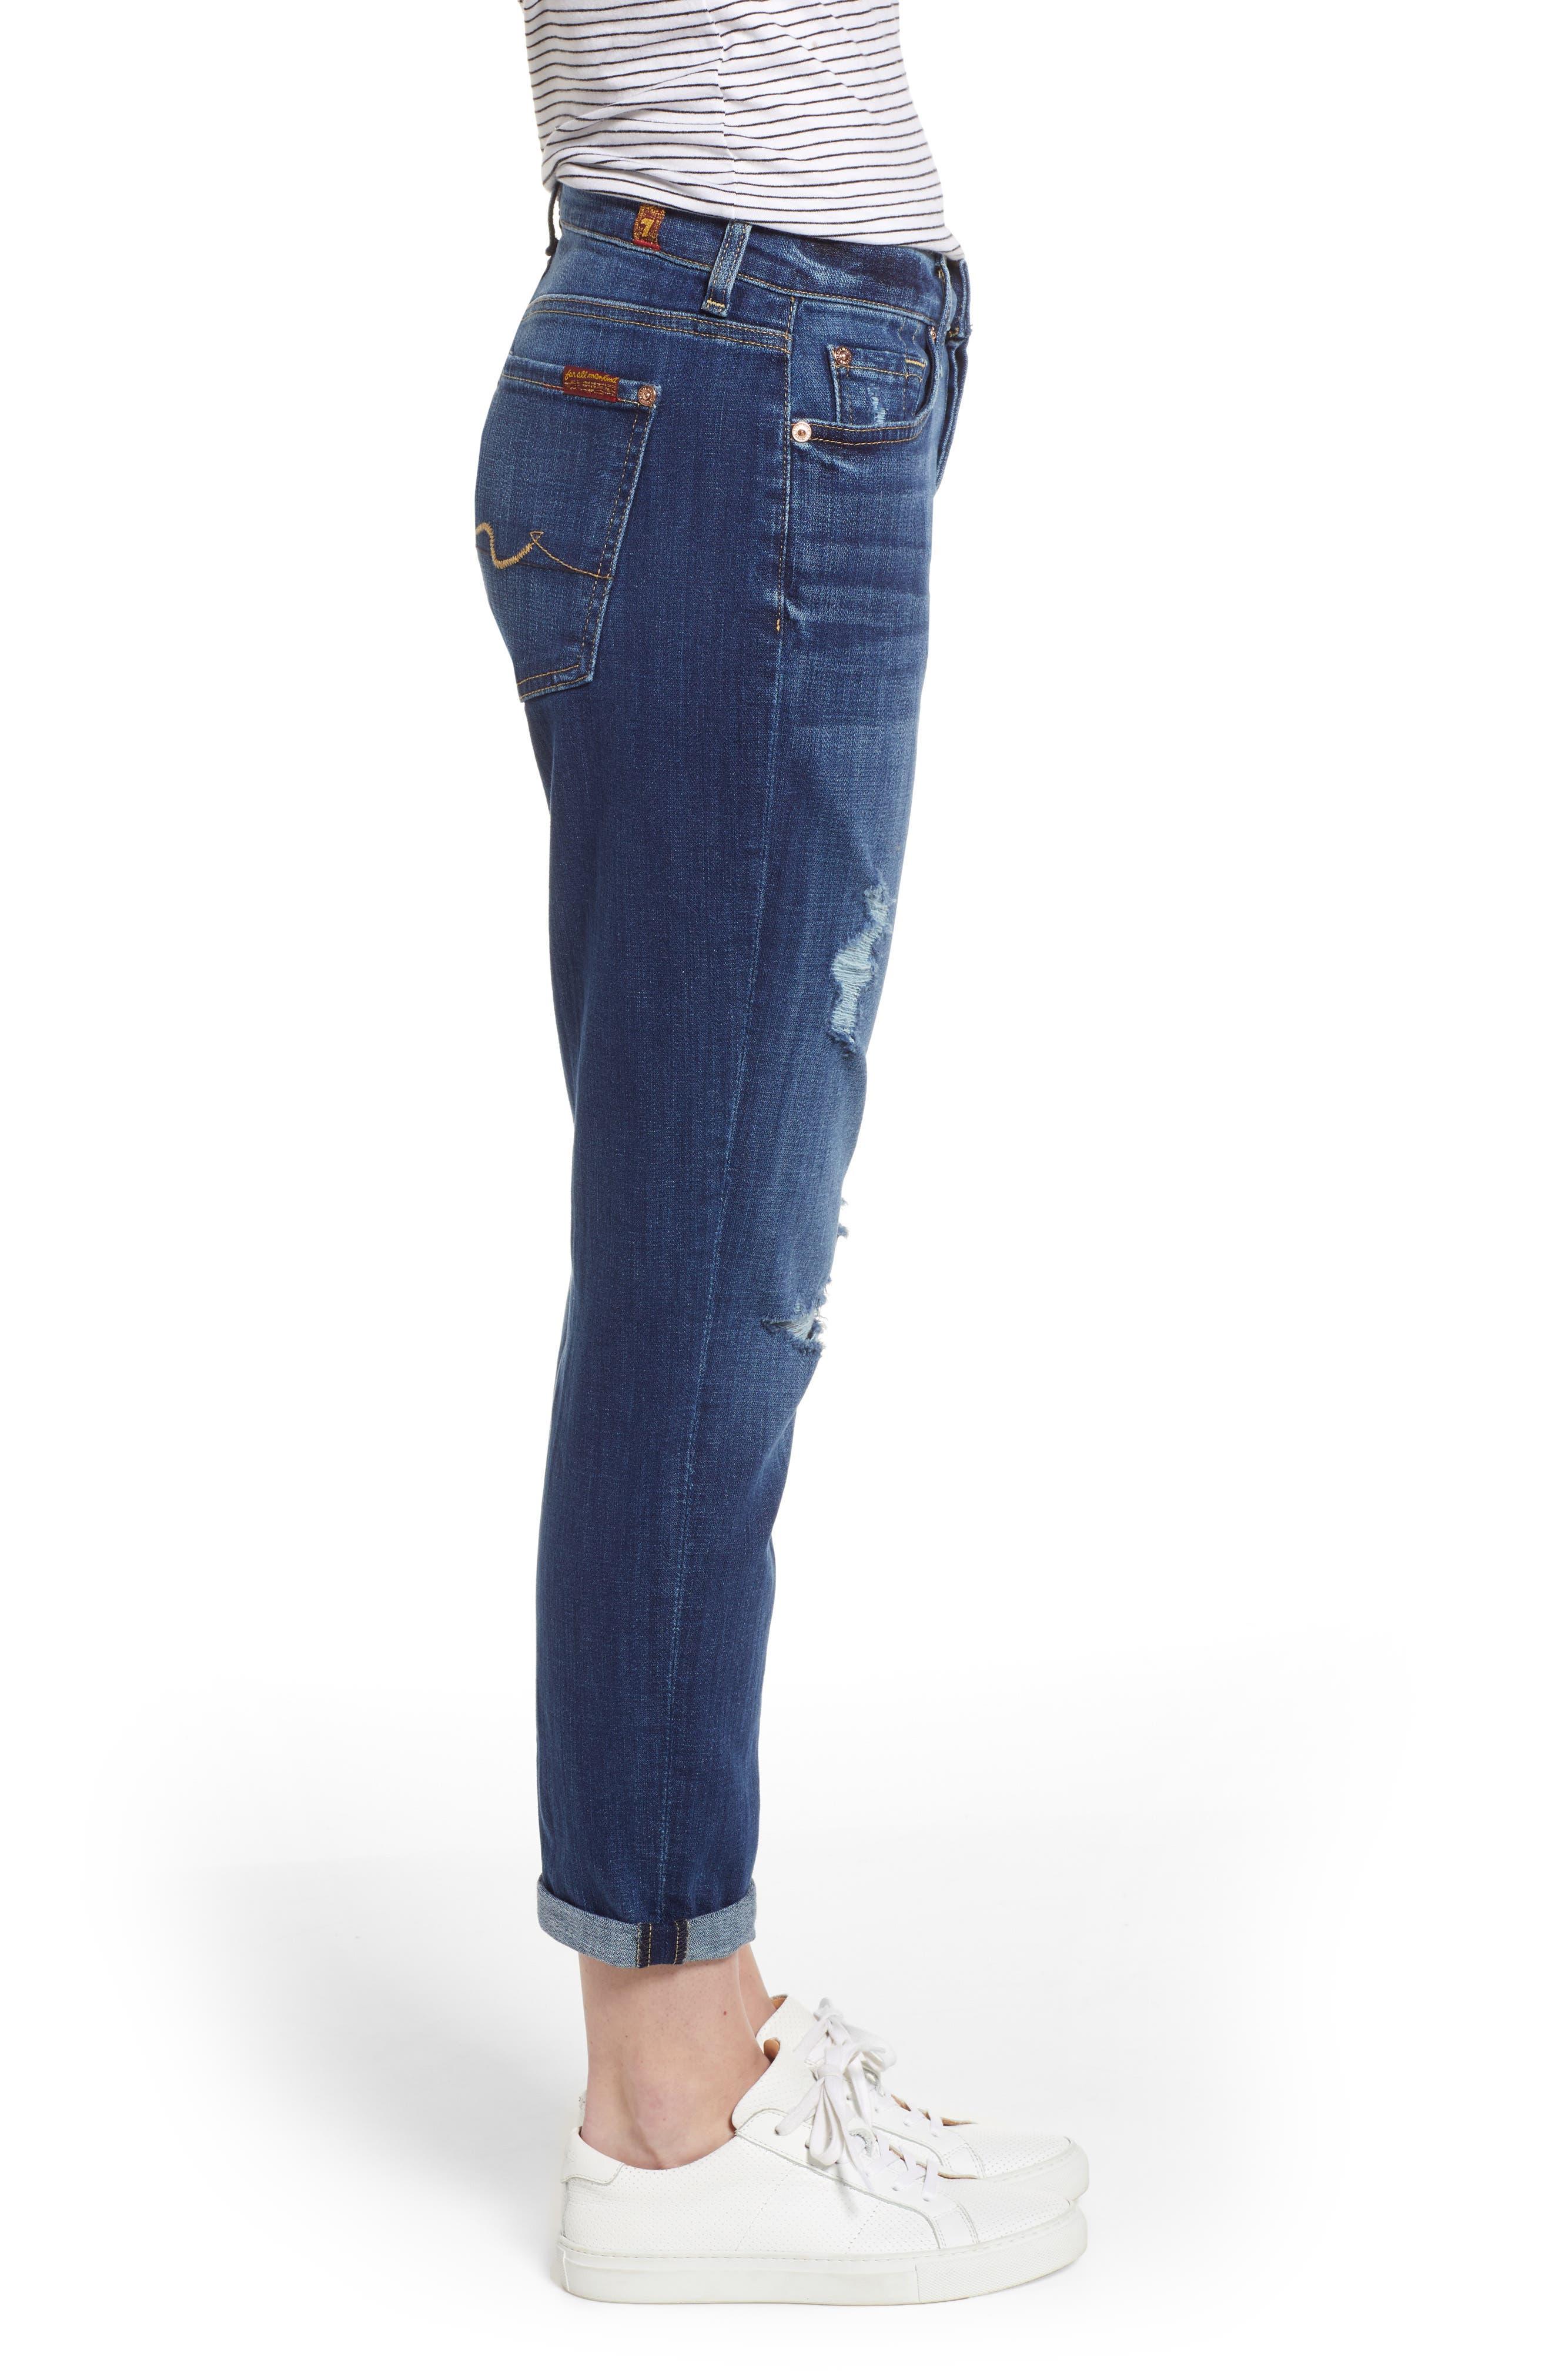 7 FOR ALL MANKIND<SUP>®</SUP>, Josefina Boyfriend Jeans, Alternate thumbnail 4, color, BROKEN TWILL VANITY W/ DESTROY